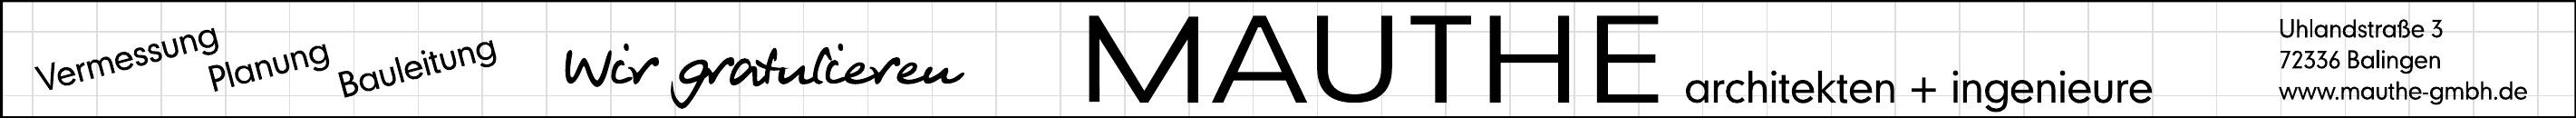 Mauthe Architekten + Ingenieure